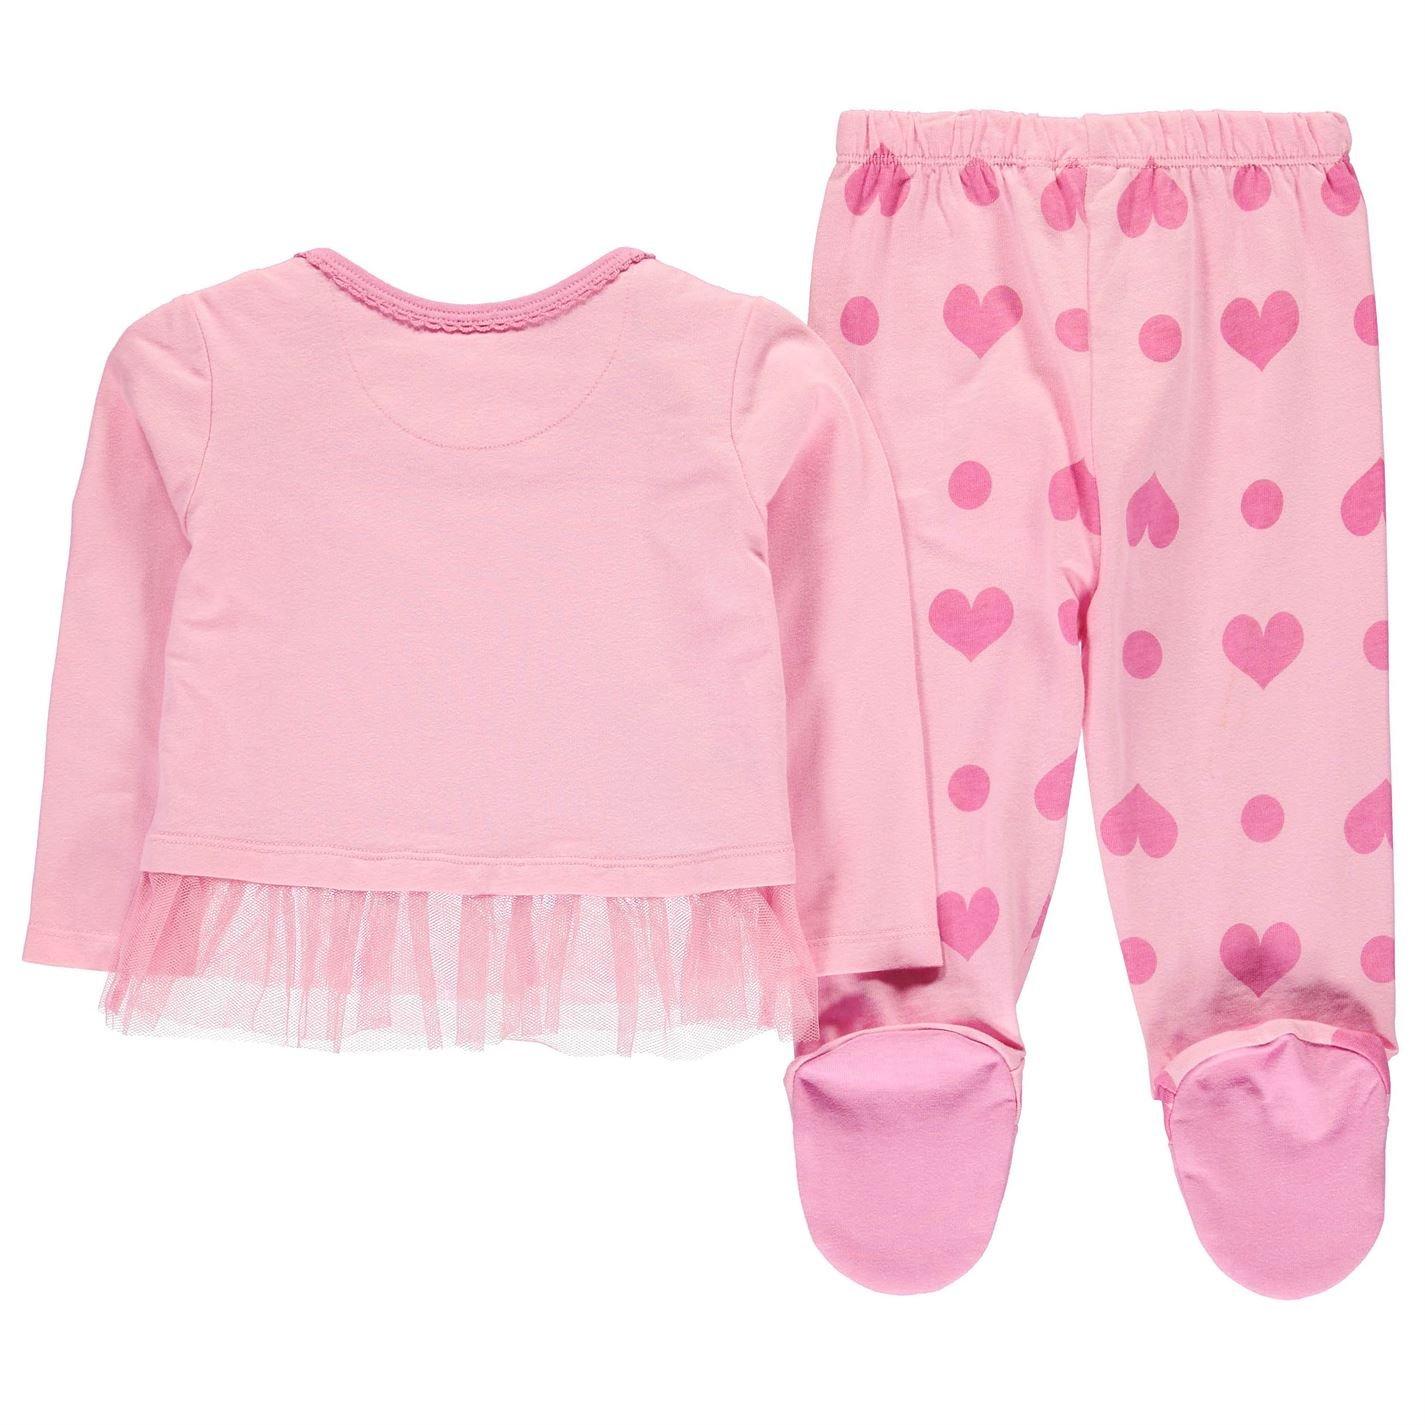 Character Enfants Pyjama Ensemble Pantalon Top Haut T-Shirt Pajama Bebe Col Rond